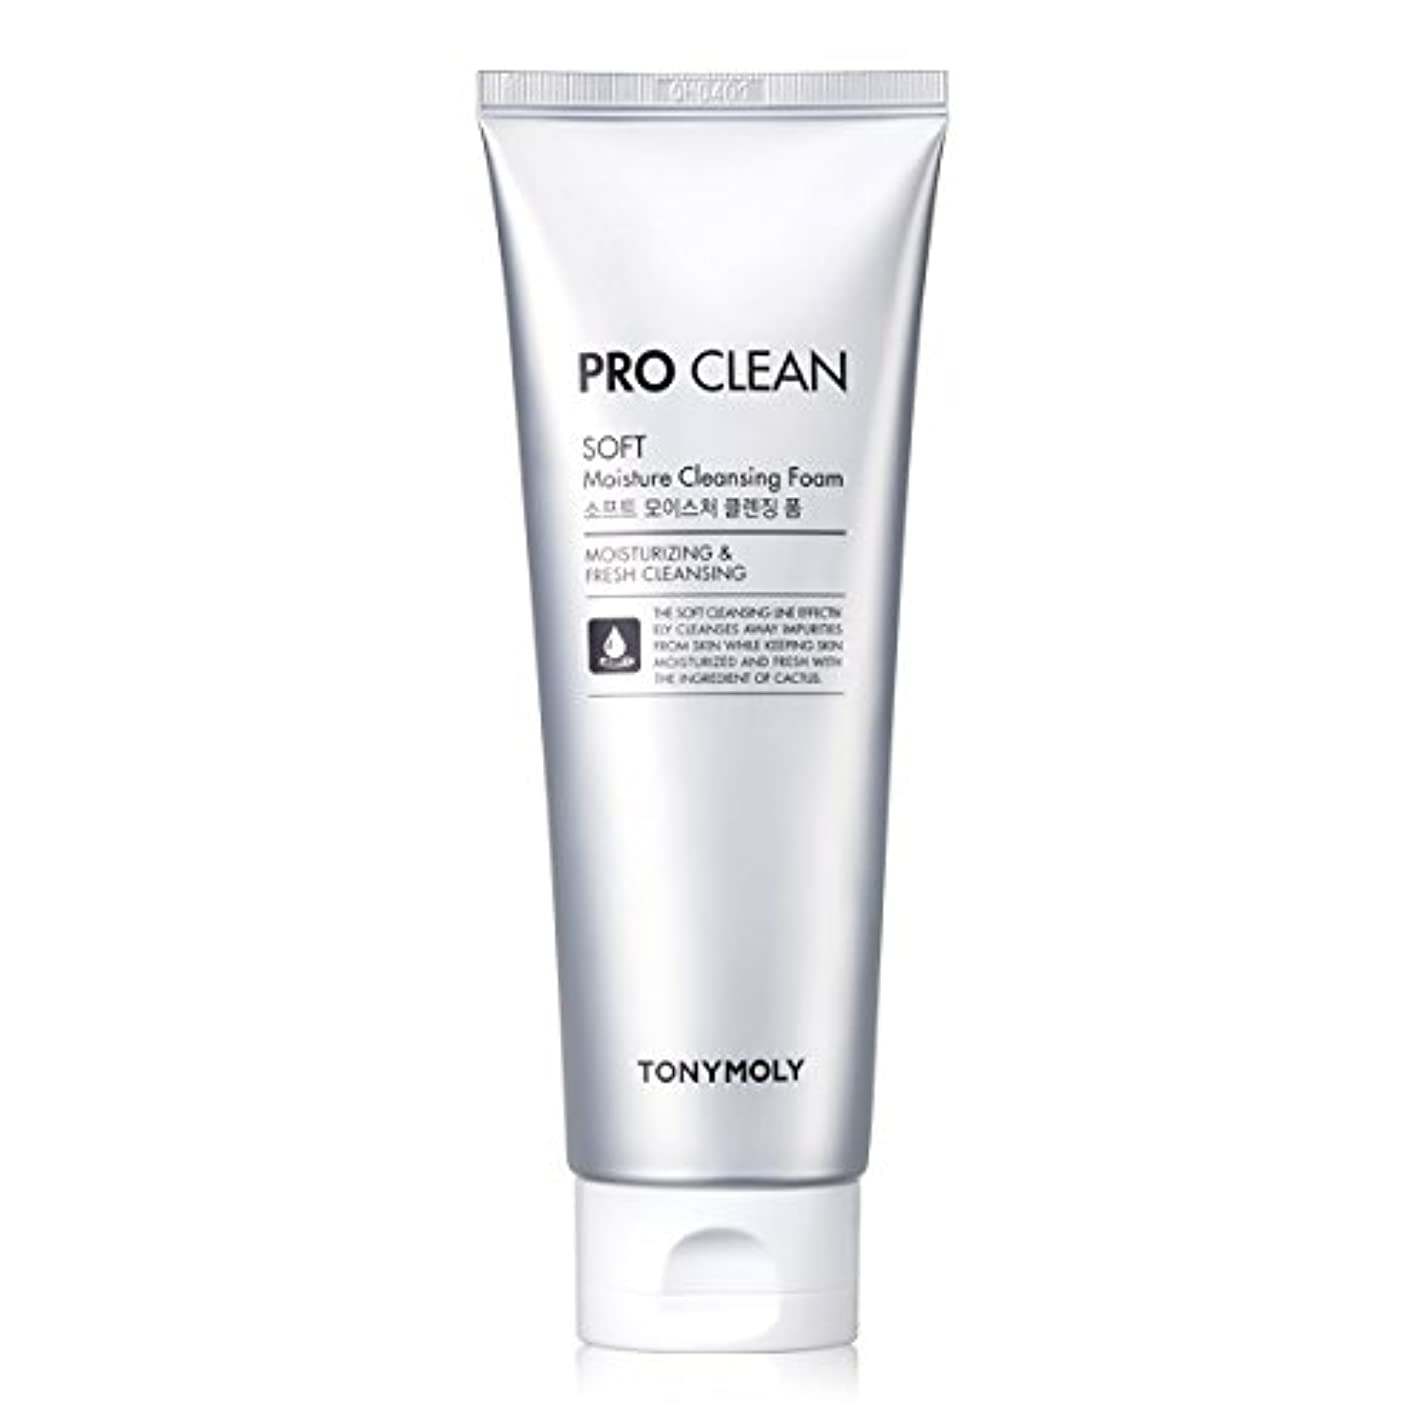 [New] TONYMOLY Pro Clean Soft Moisture Cleansing Foam 150ml/トニーモリー プロ クリーン ソフト モイスチャー クレンジングフォーム 150ml [並行輸入品]